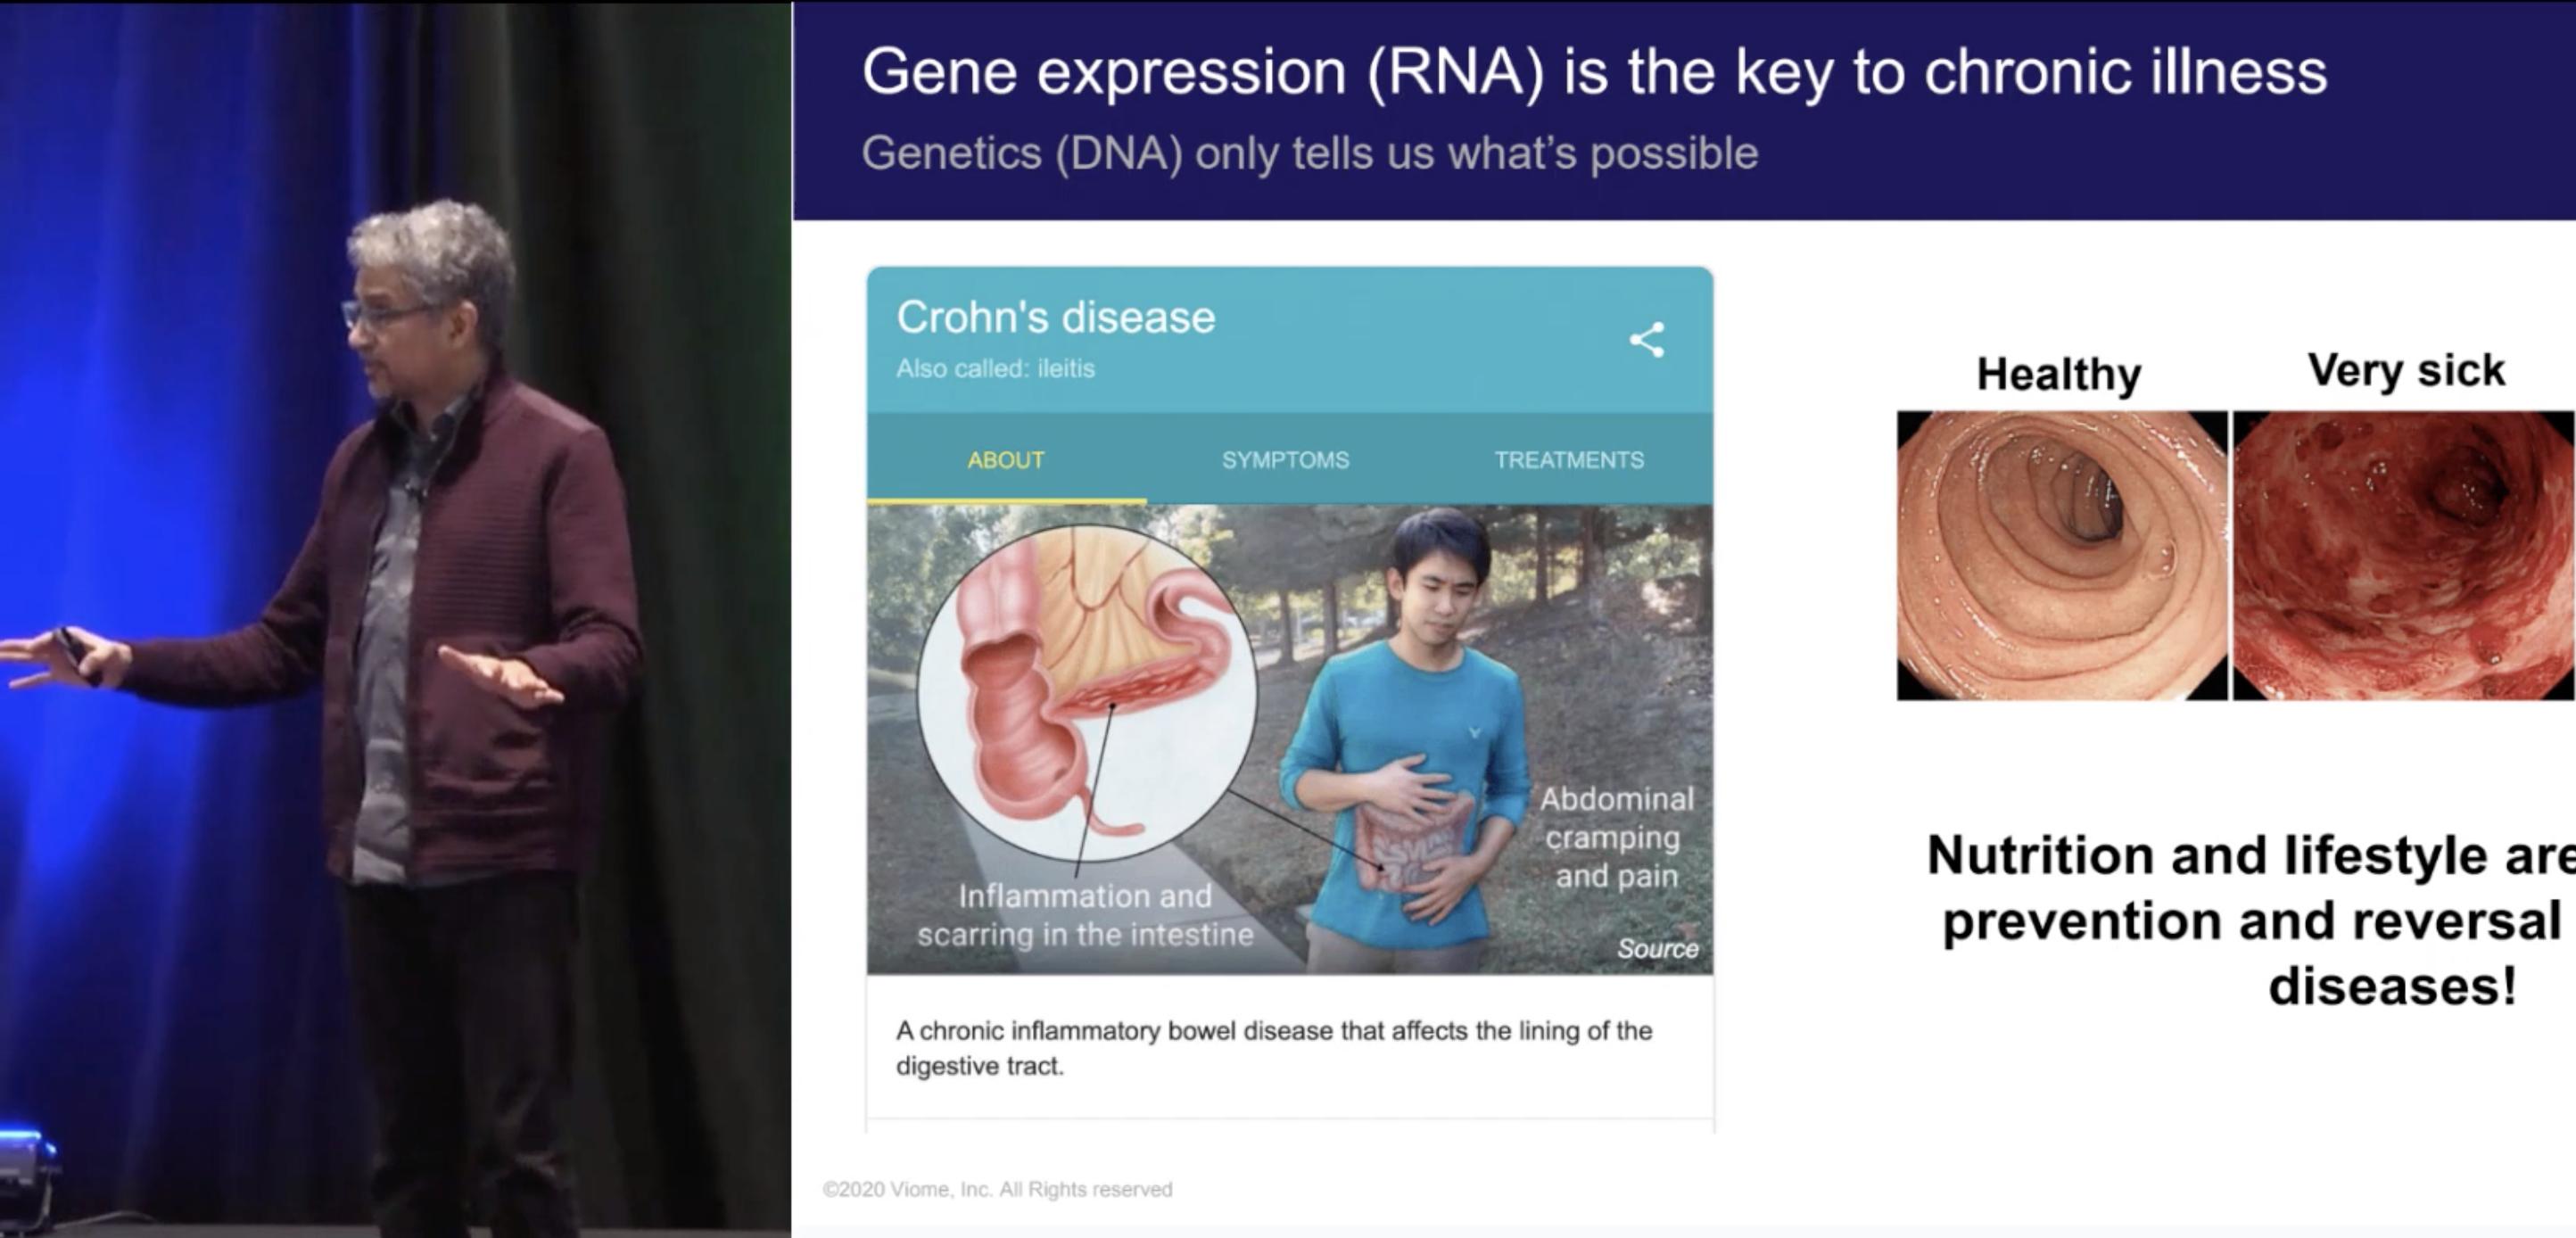 Machine Learning from Microbiome Metatranscriptomics Predicts Chronic Diseases - Guru Banavar, Viome